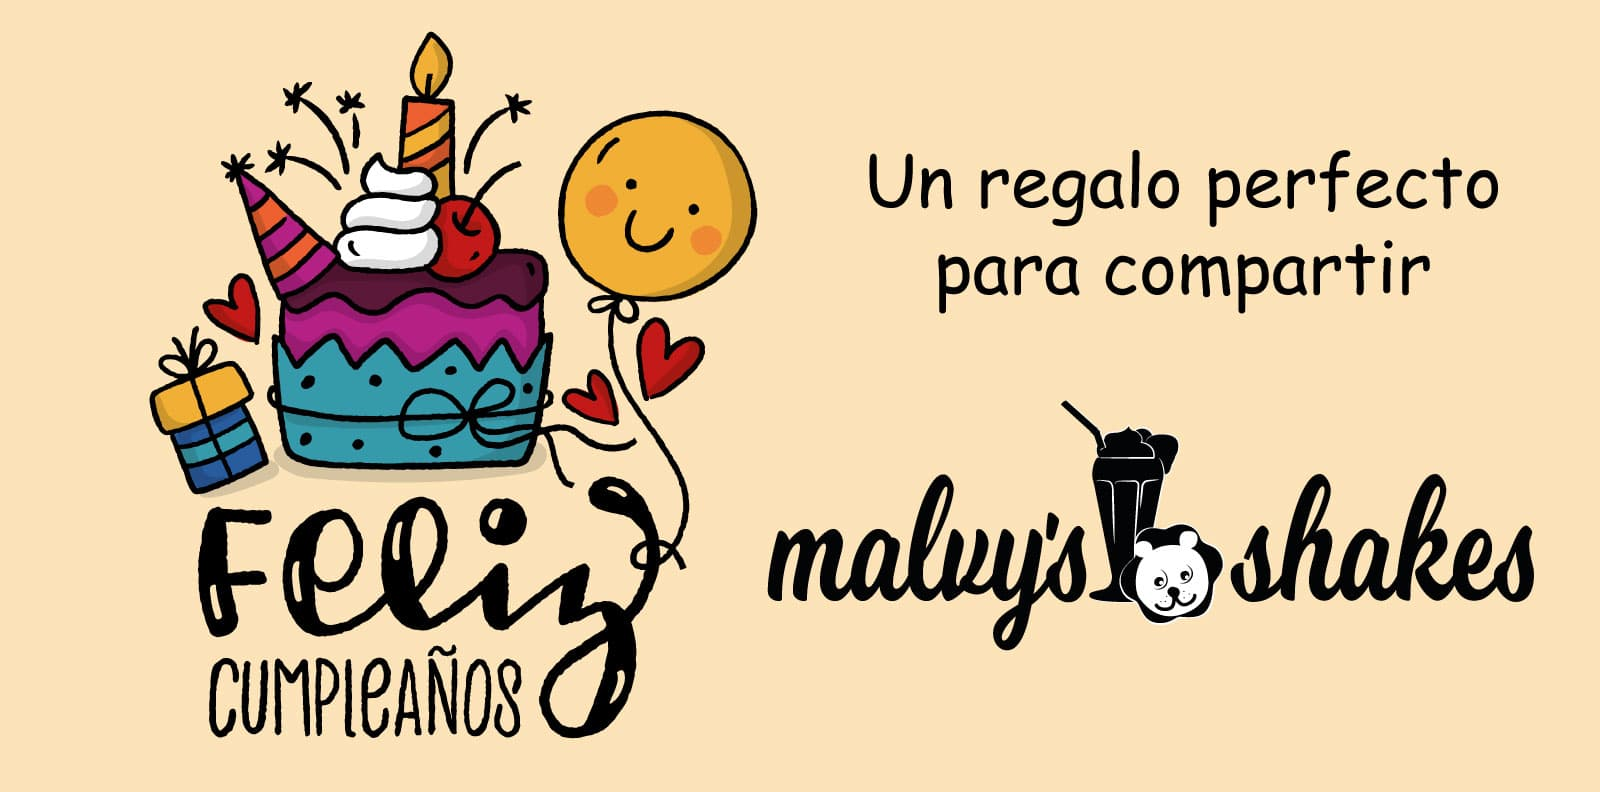 Feliz-Cumpleaños Malvys shakes